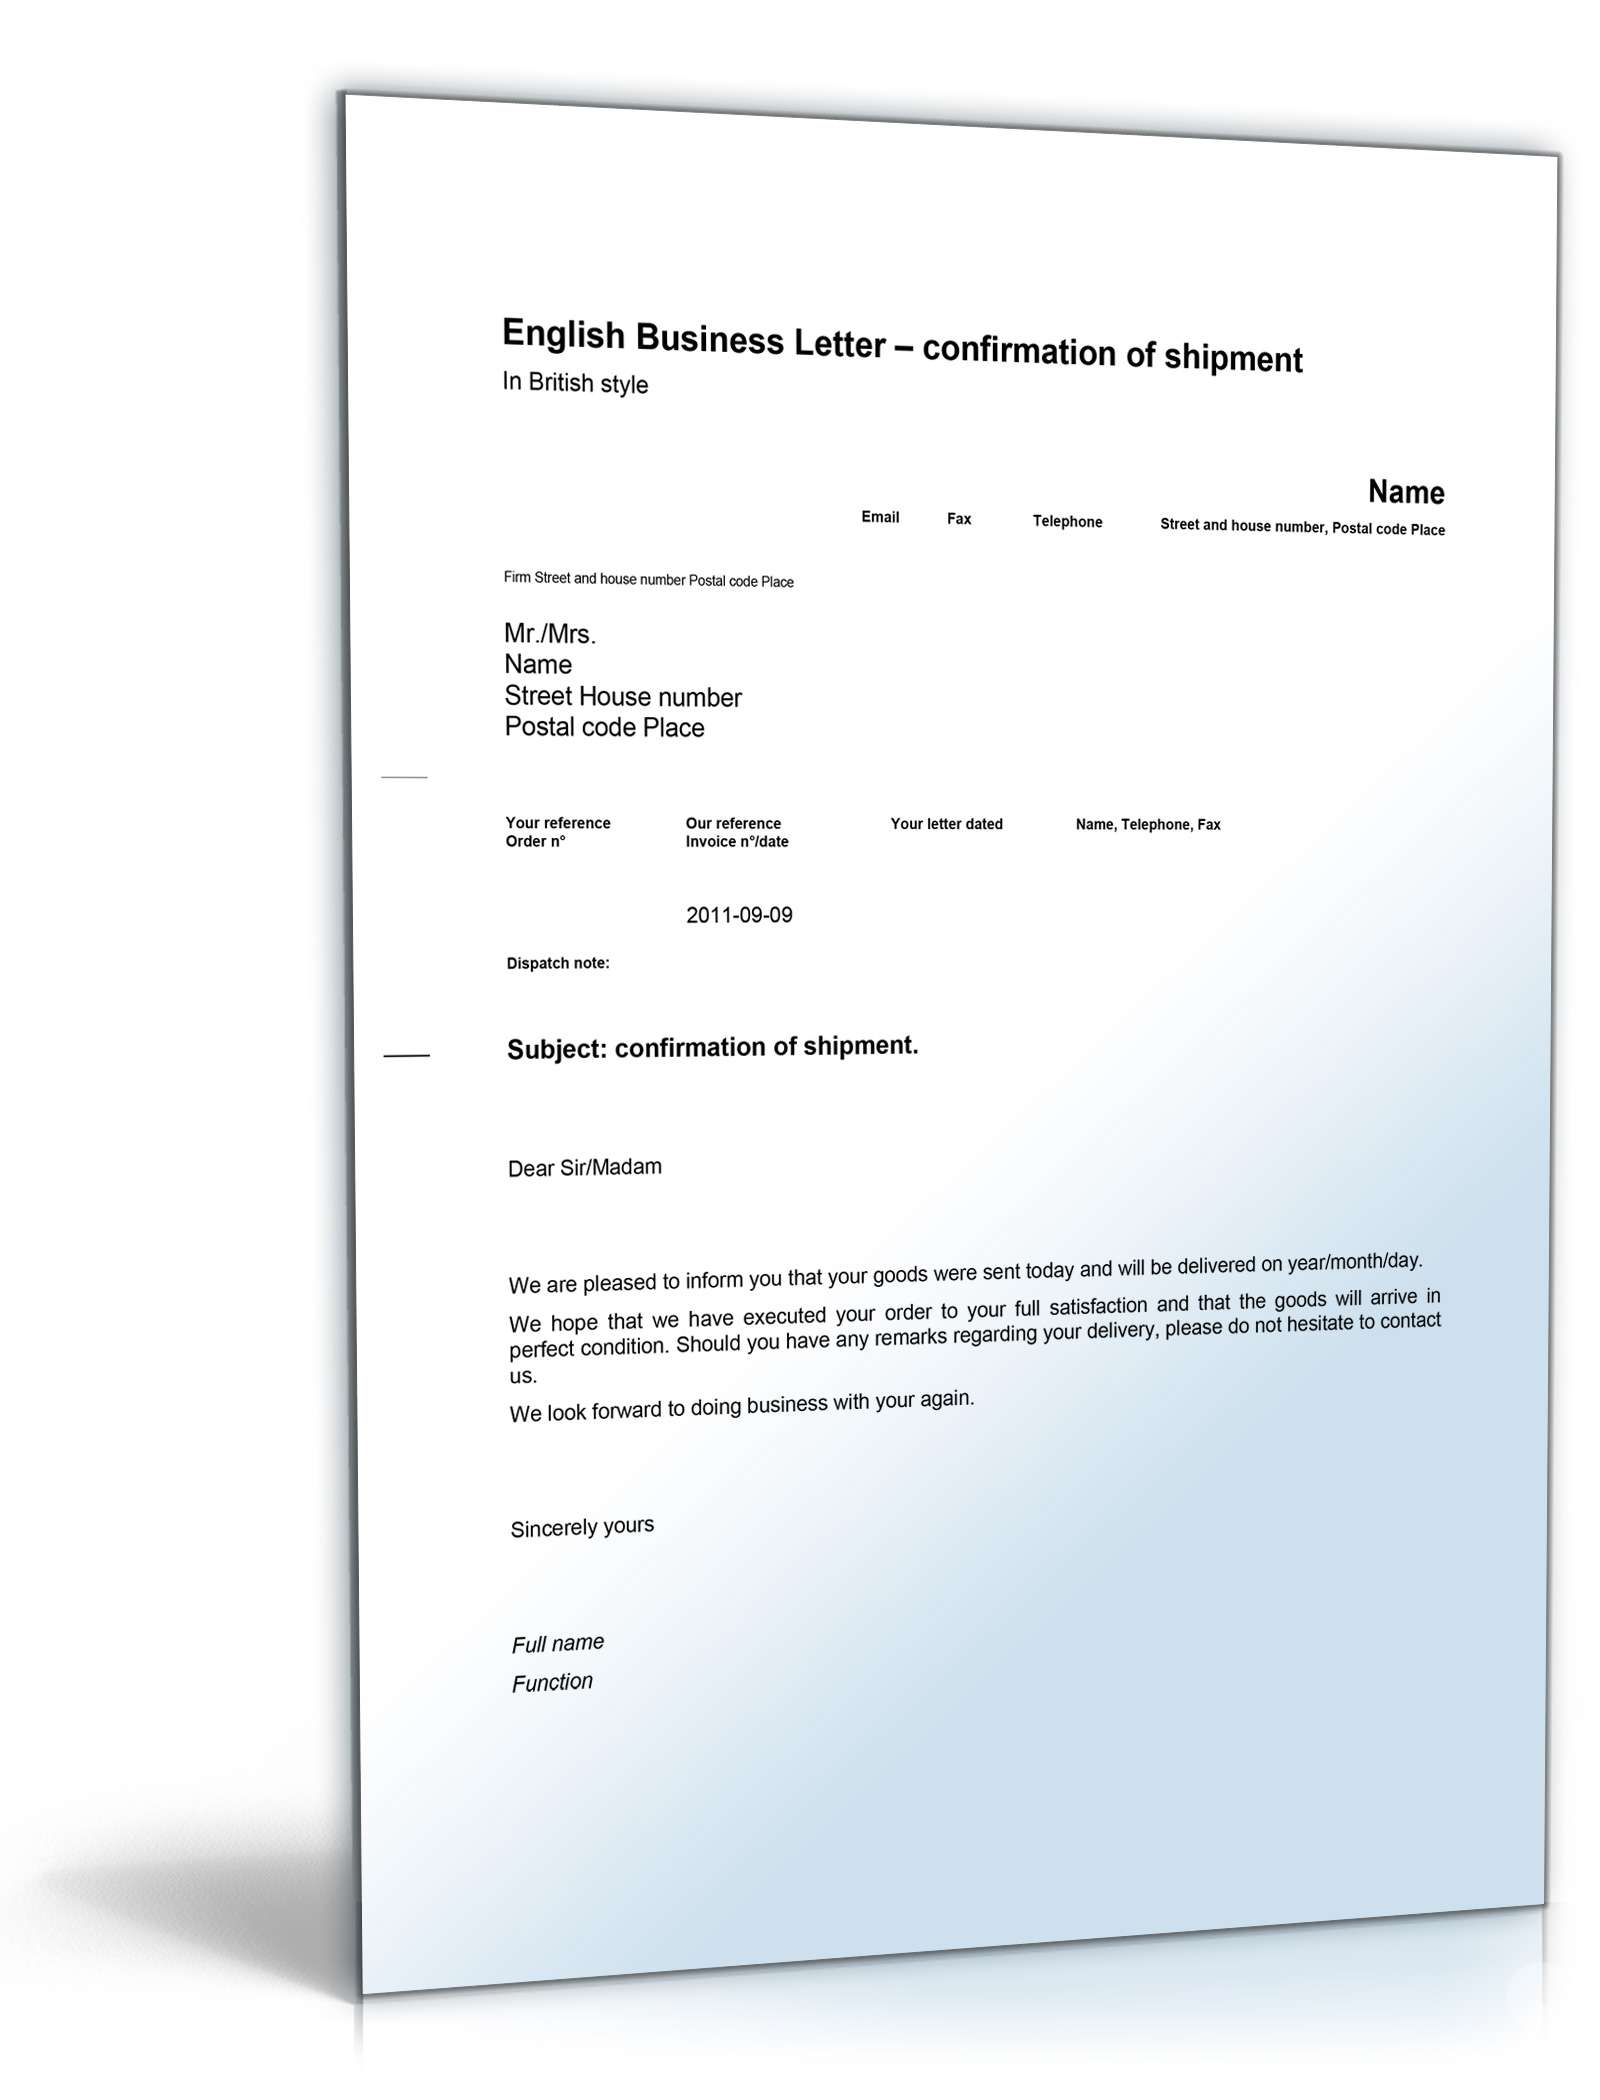 Versandbestätigung Shipment Confirmation Geschäftsbrief Sofort